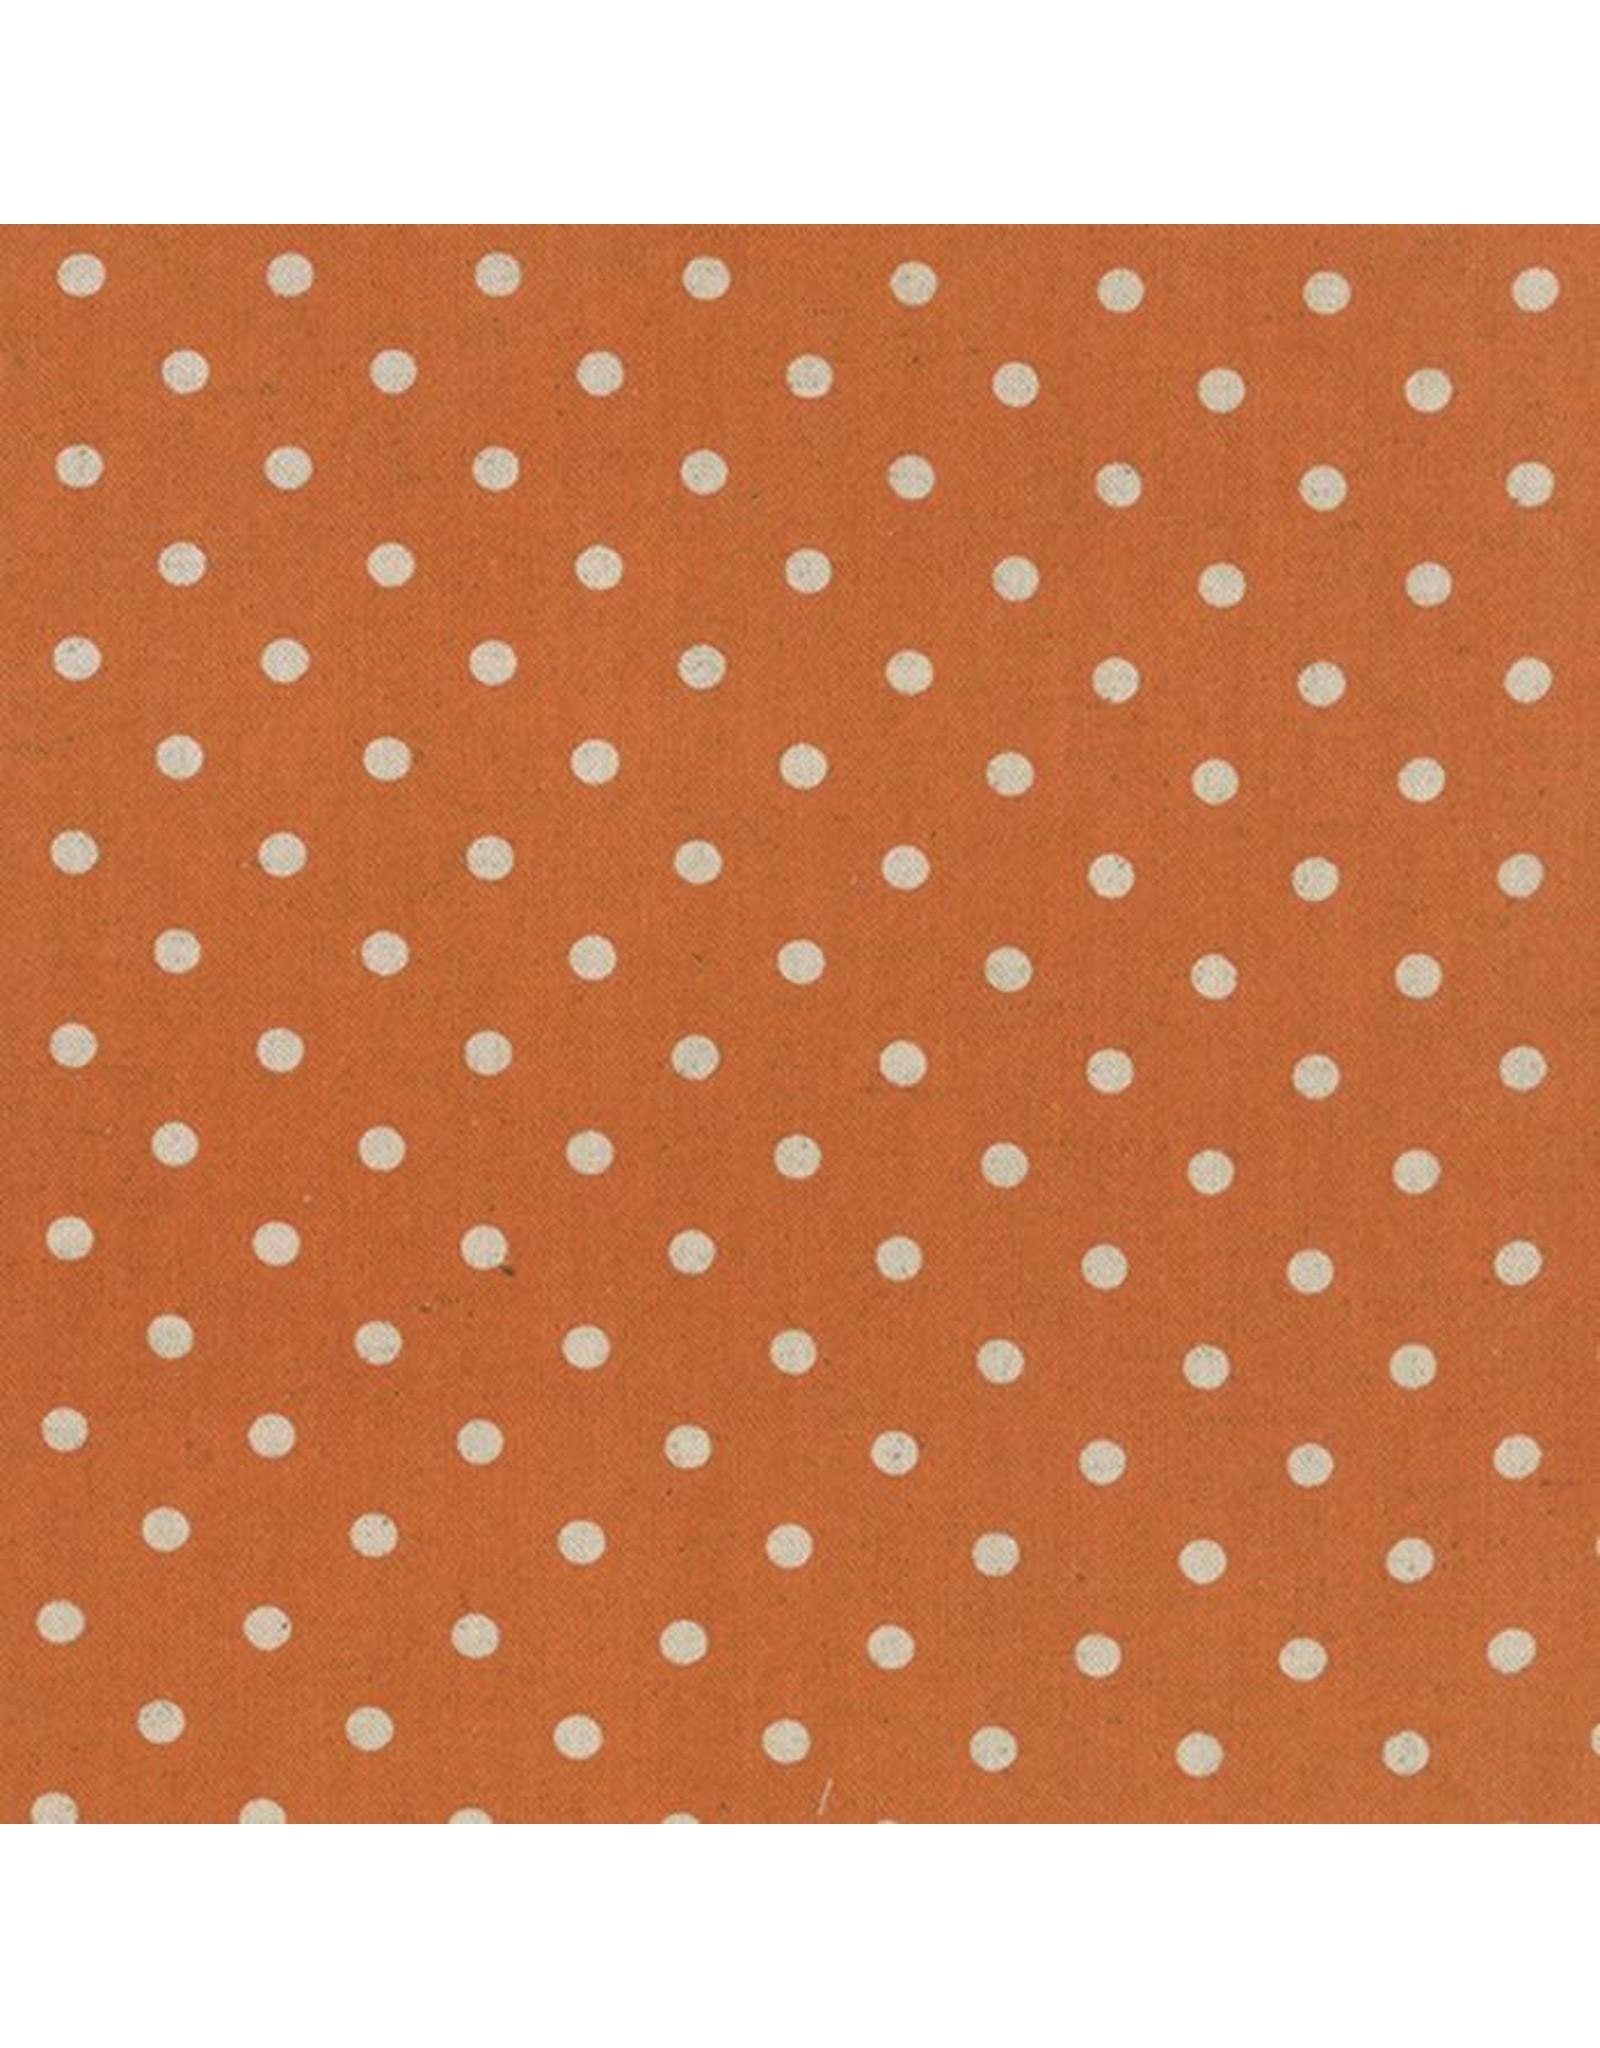 Moda Linen Mochi Dot in Longhorn, Fabric Half-Yards 32910 32L